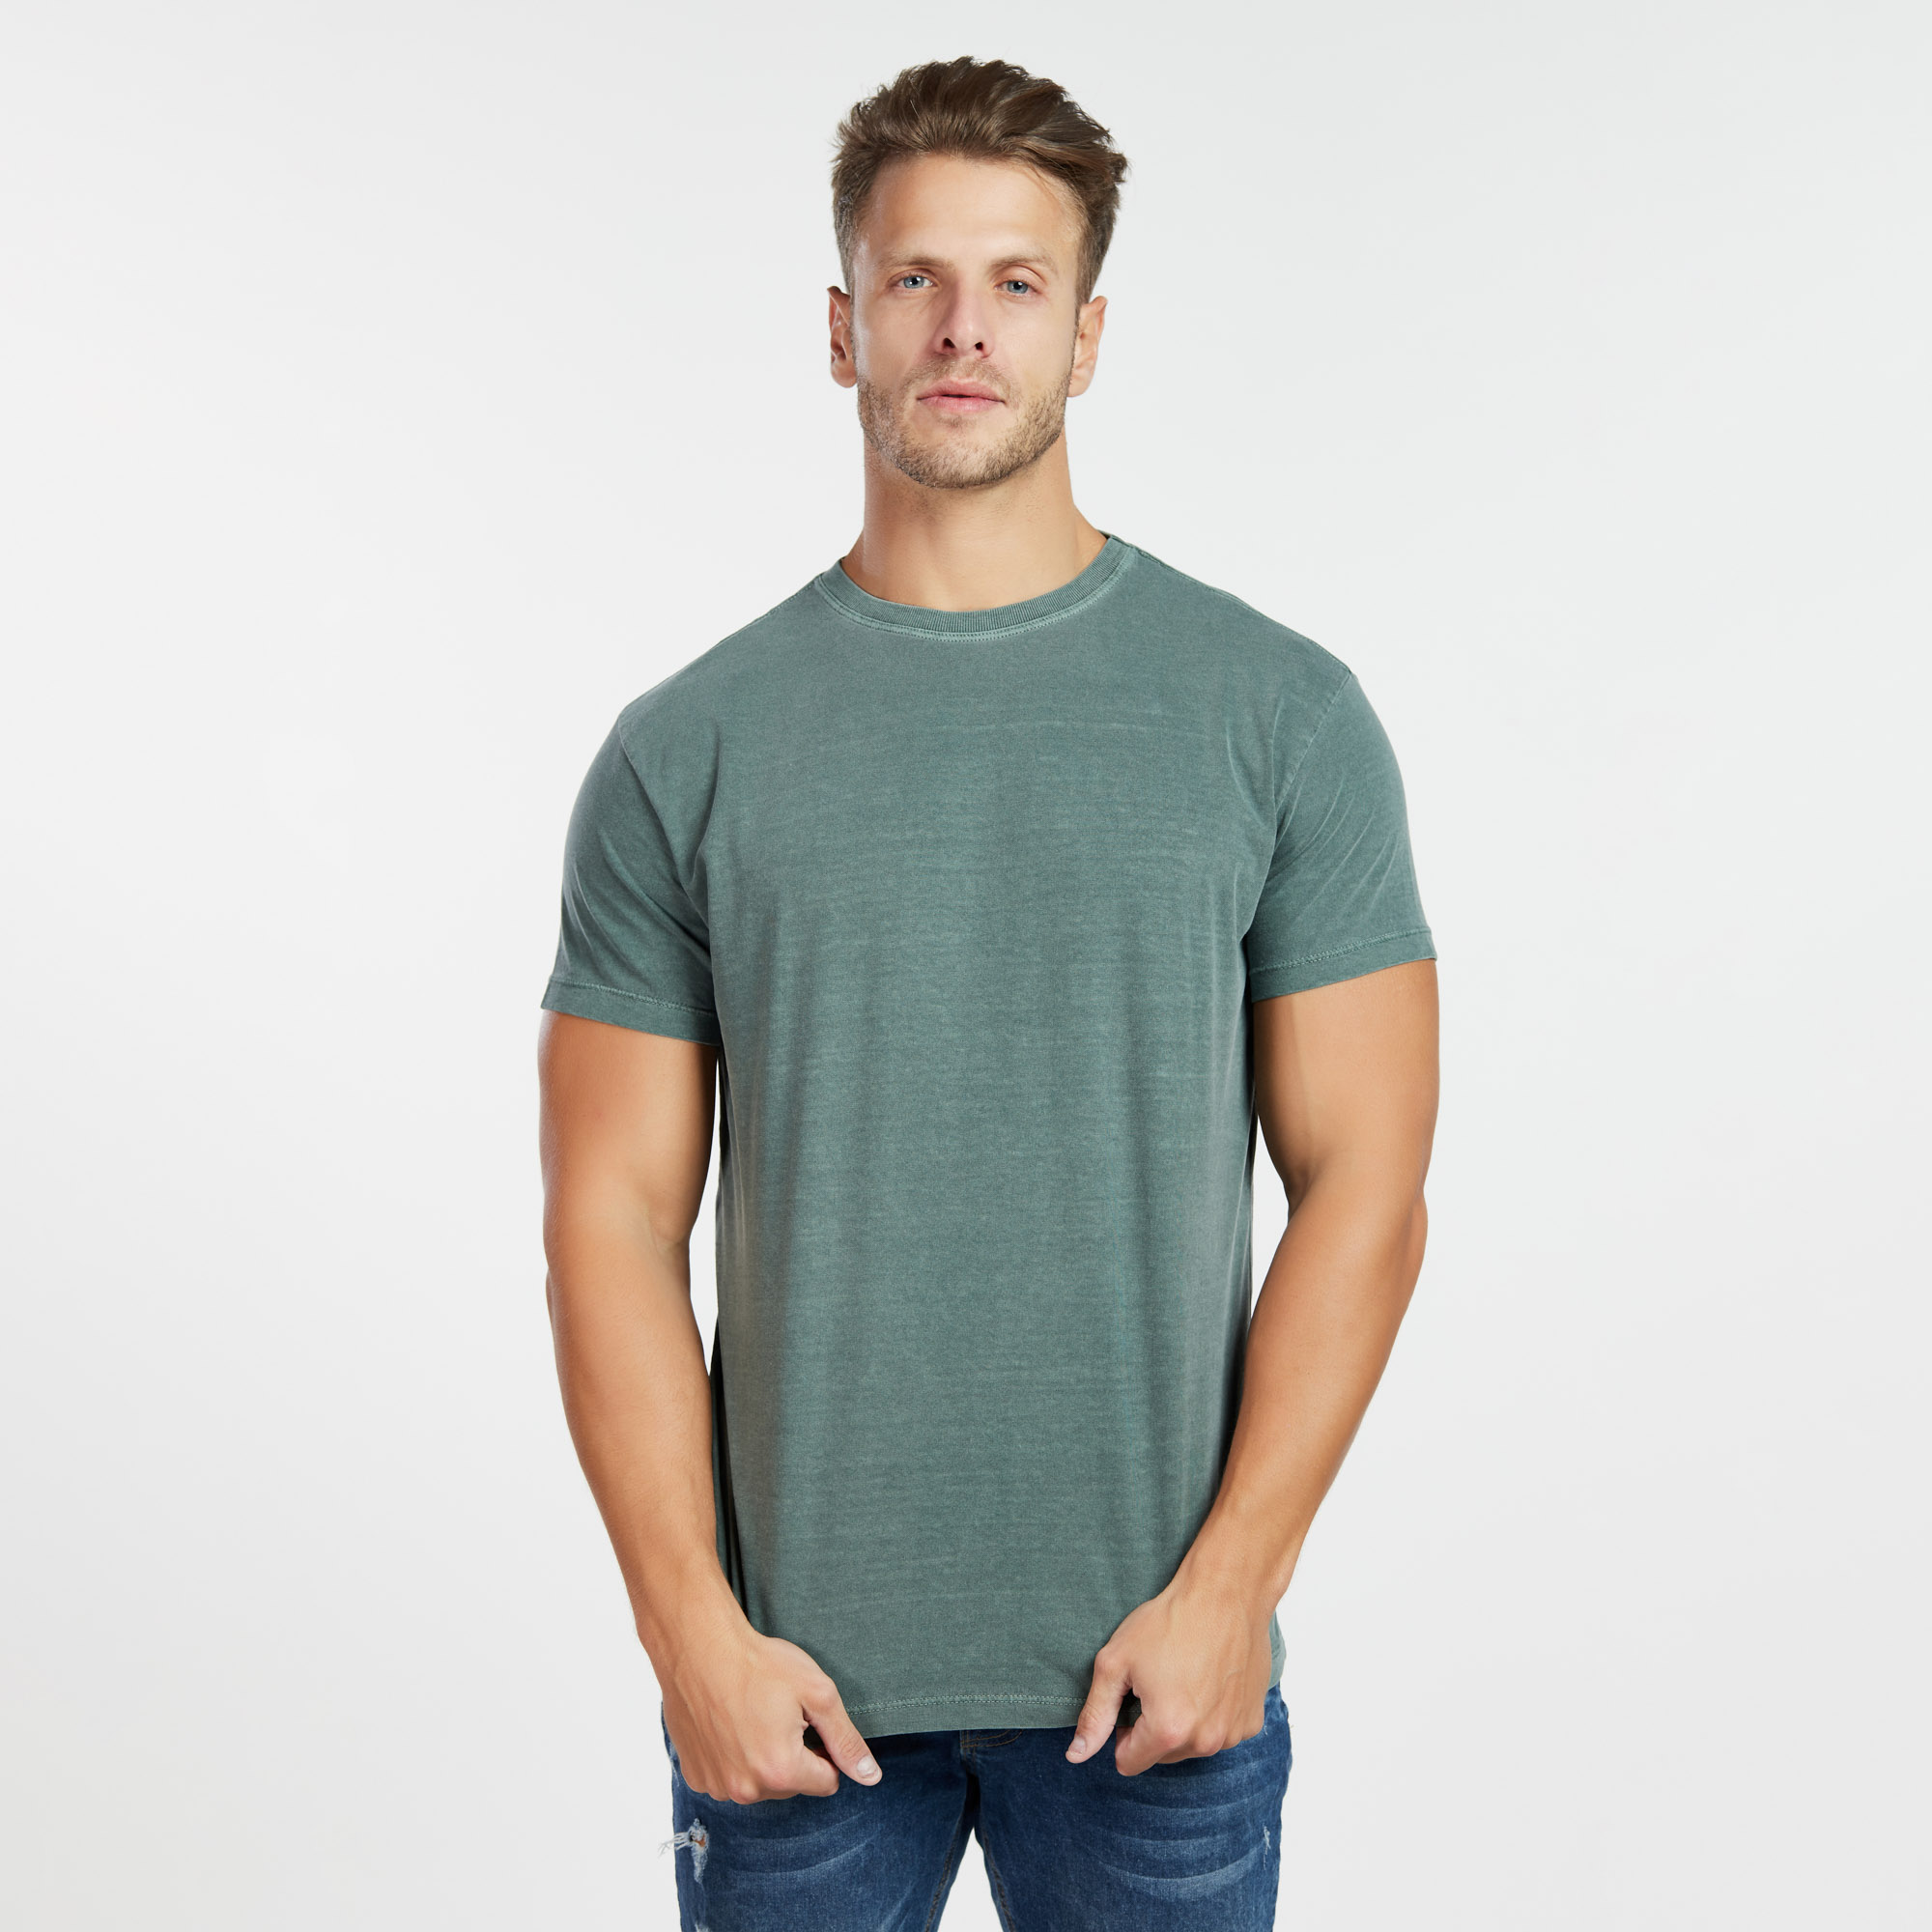 Camiseta Masculina Estonada Verde Escuro